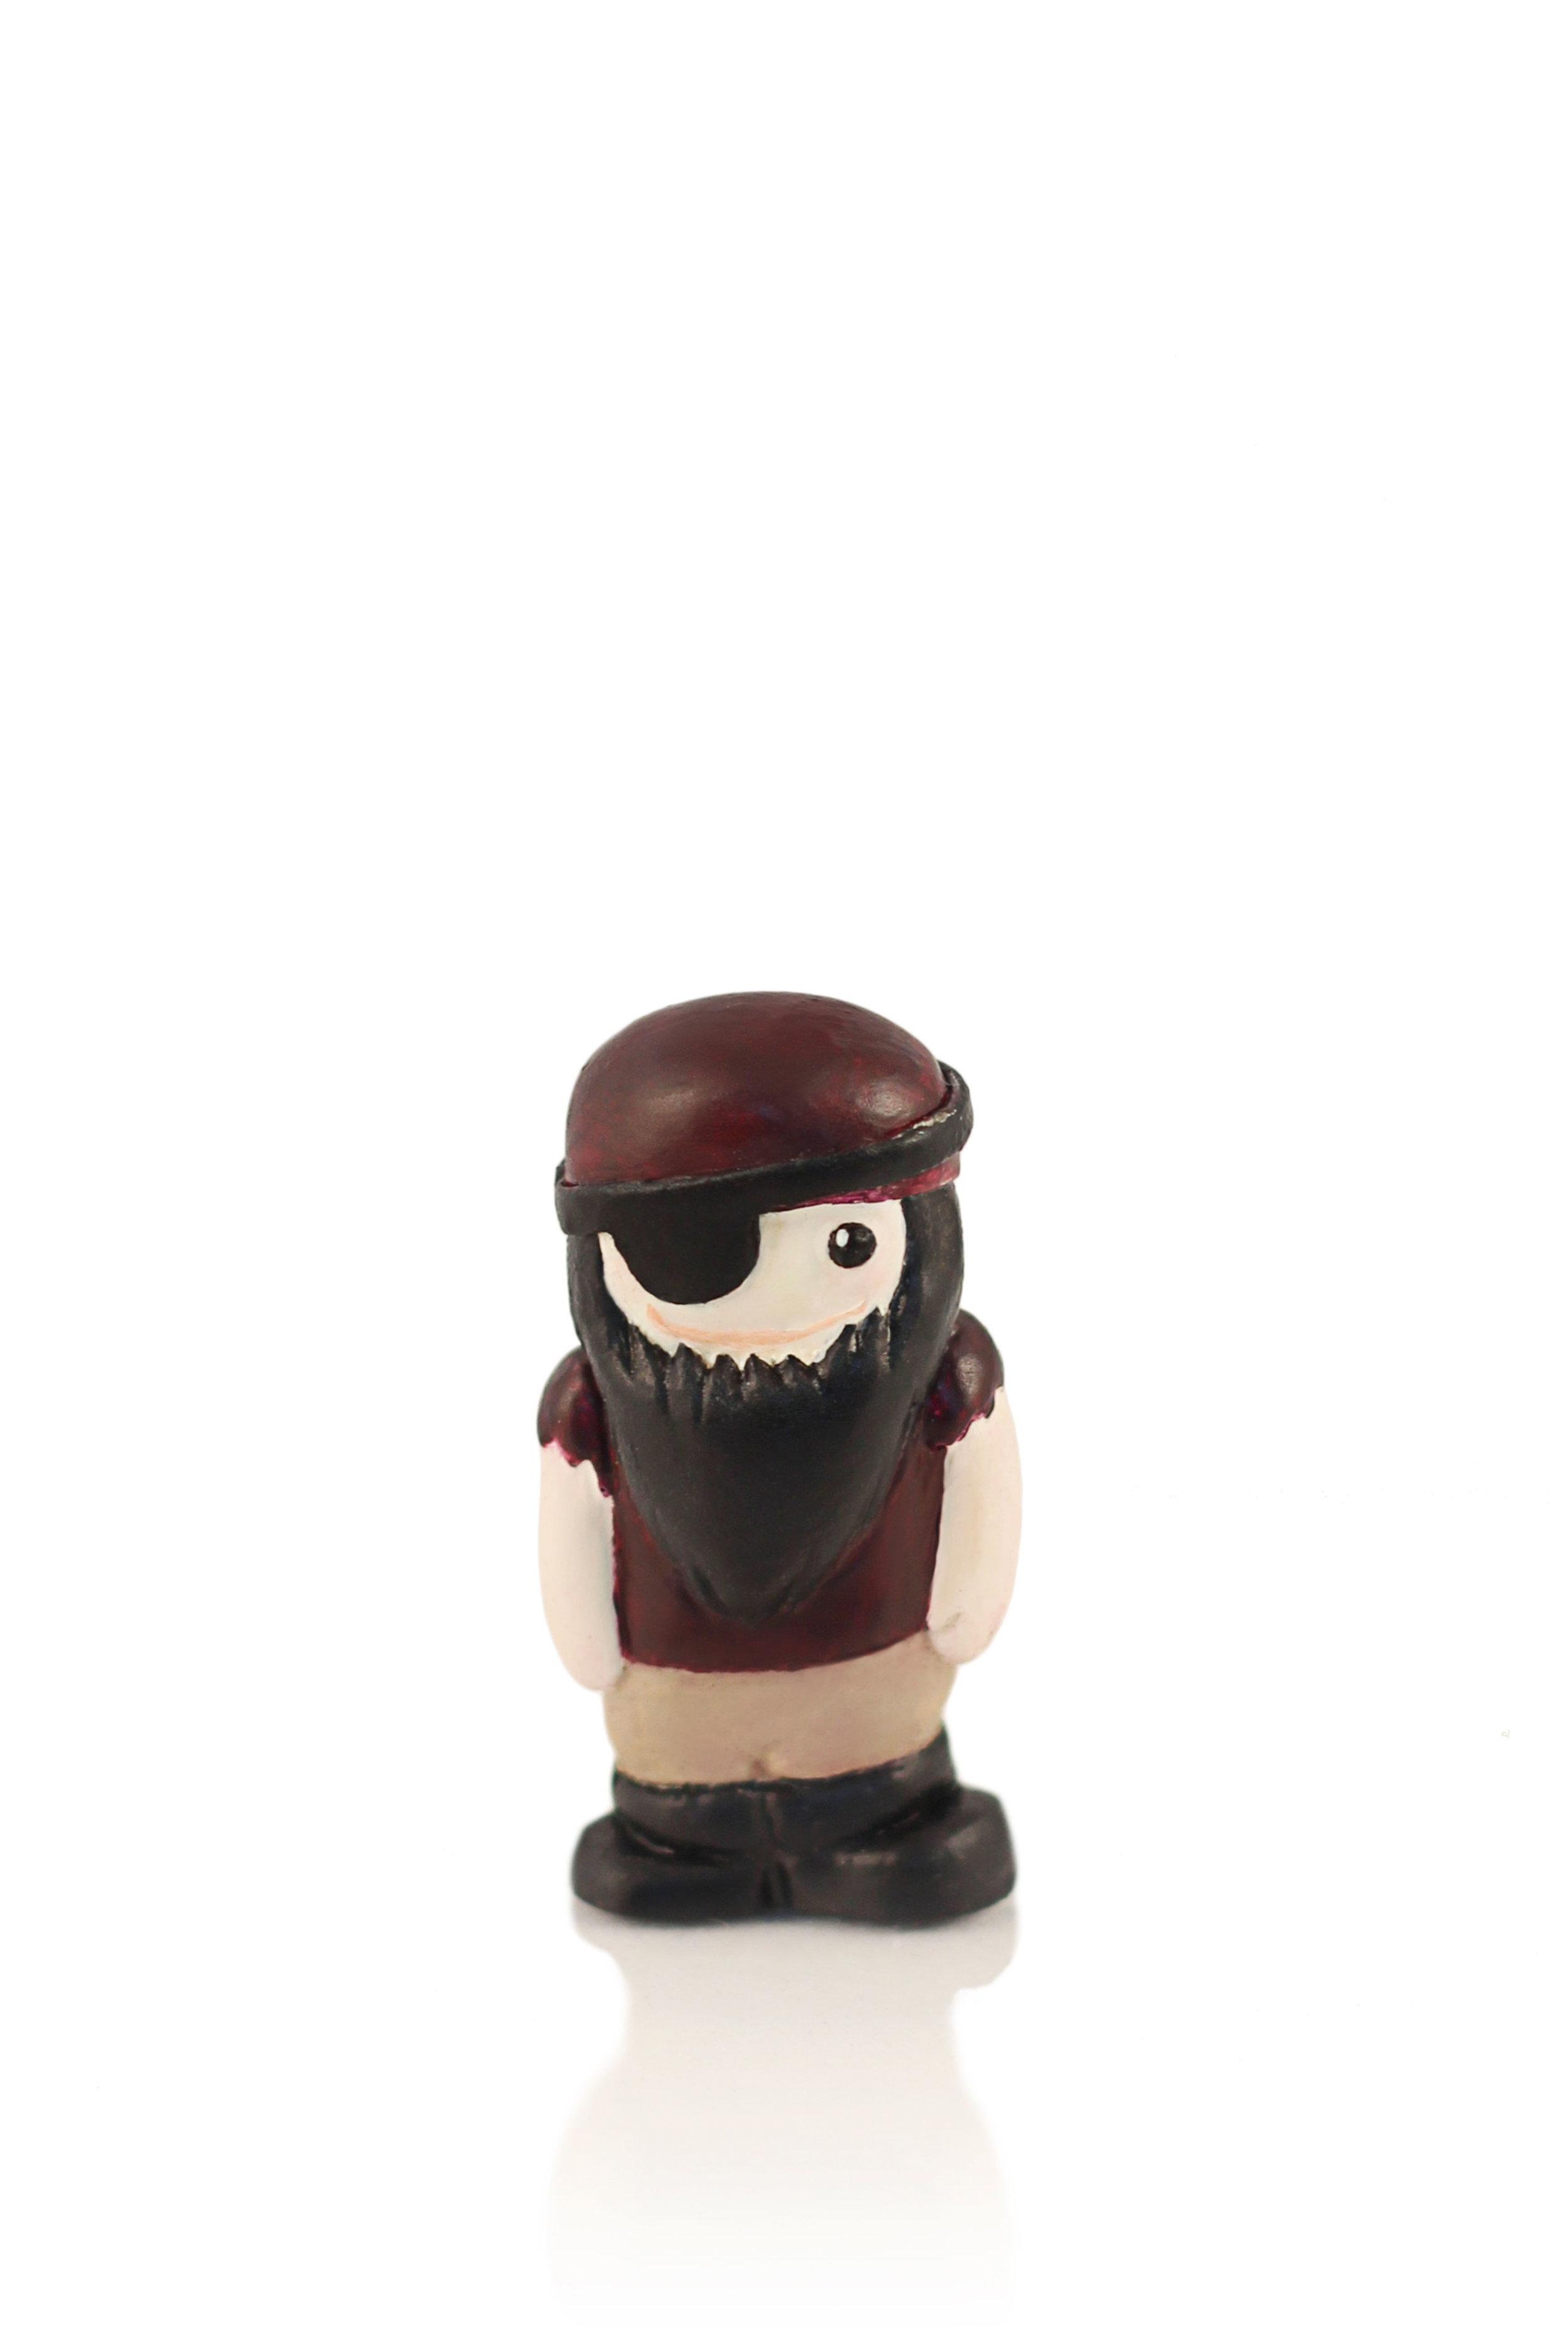 Pocket Pirate- Black Beard Edition